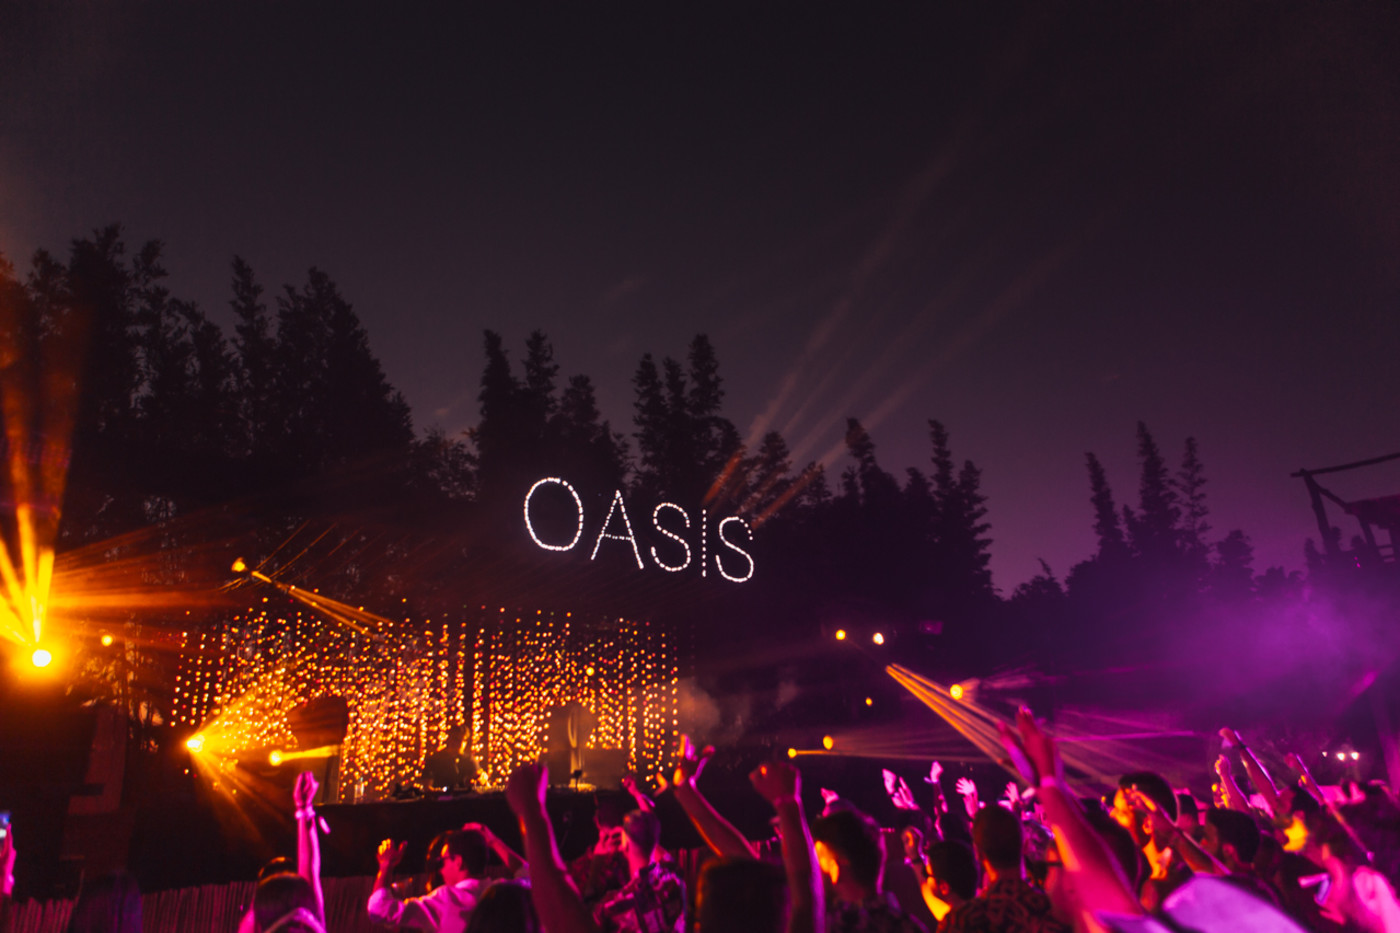 oasis-festival